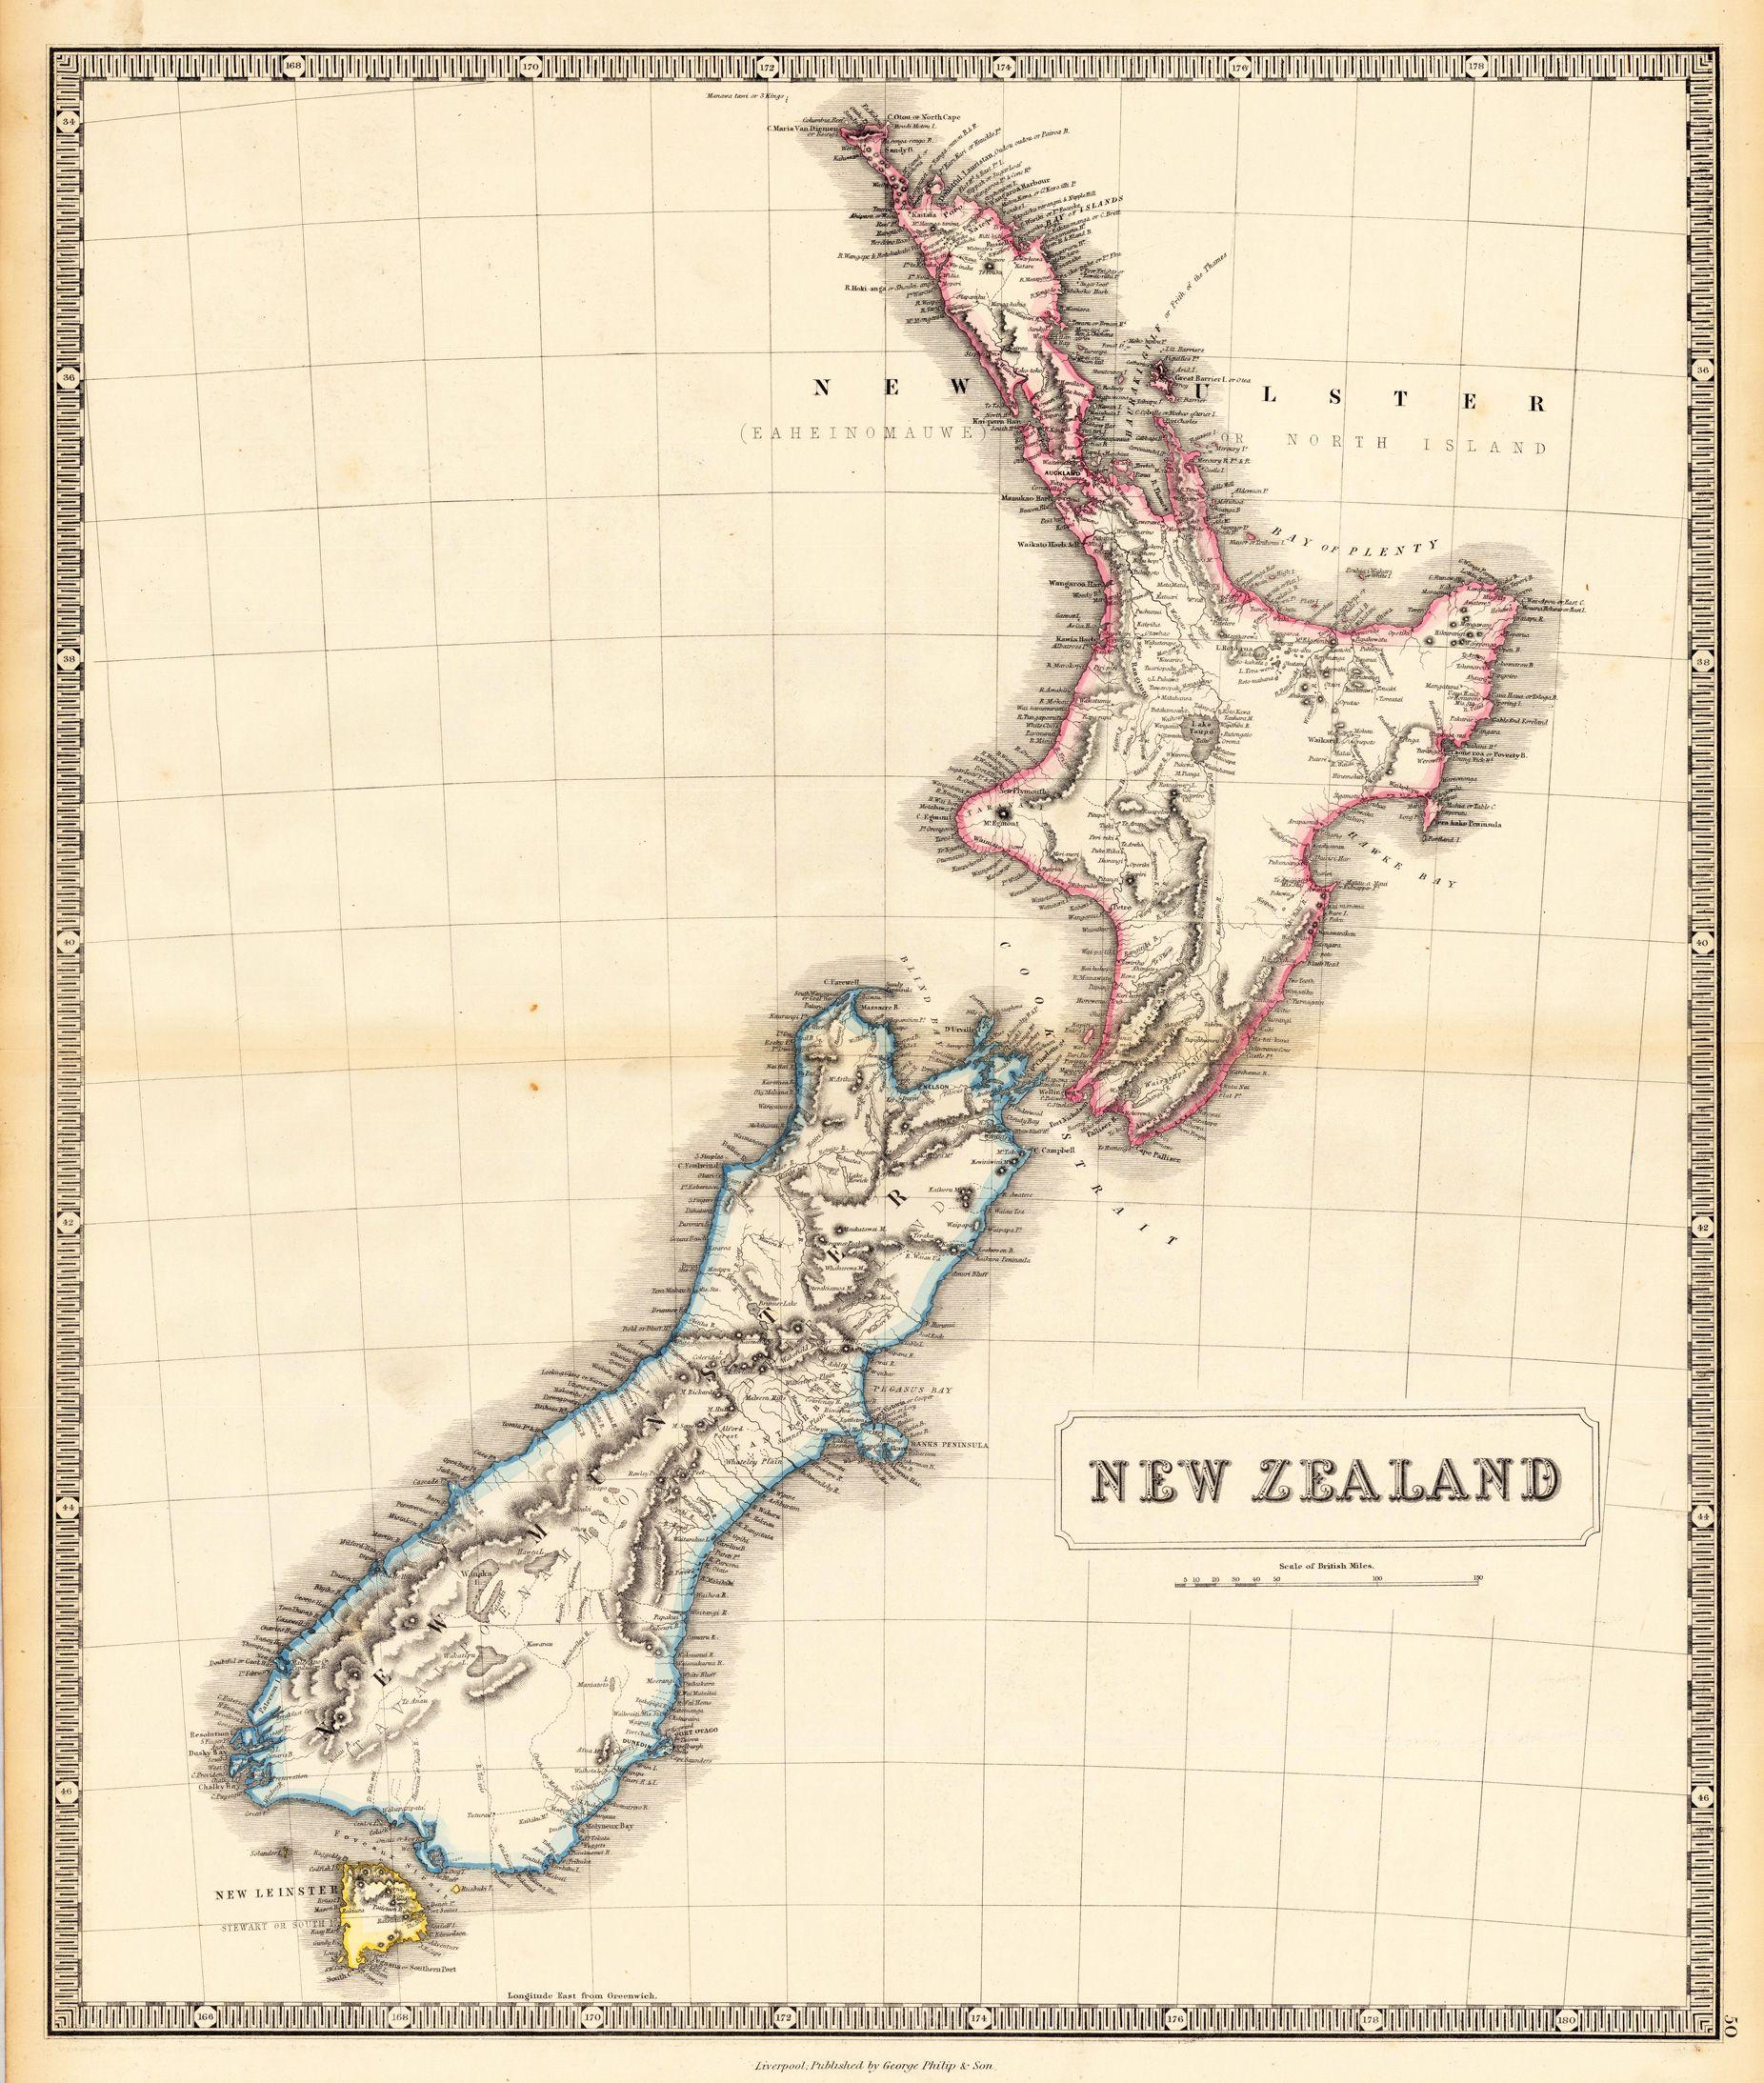 Google Image Result For Http Www Alte Landkarten De Images 18660 01 Jpg New Zealand Tattoo New Zealand Flag Old Maps